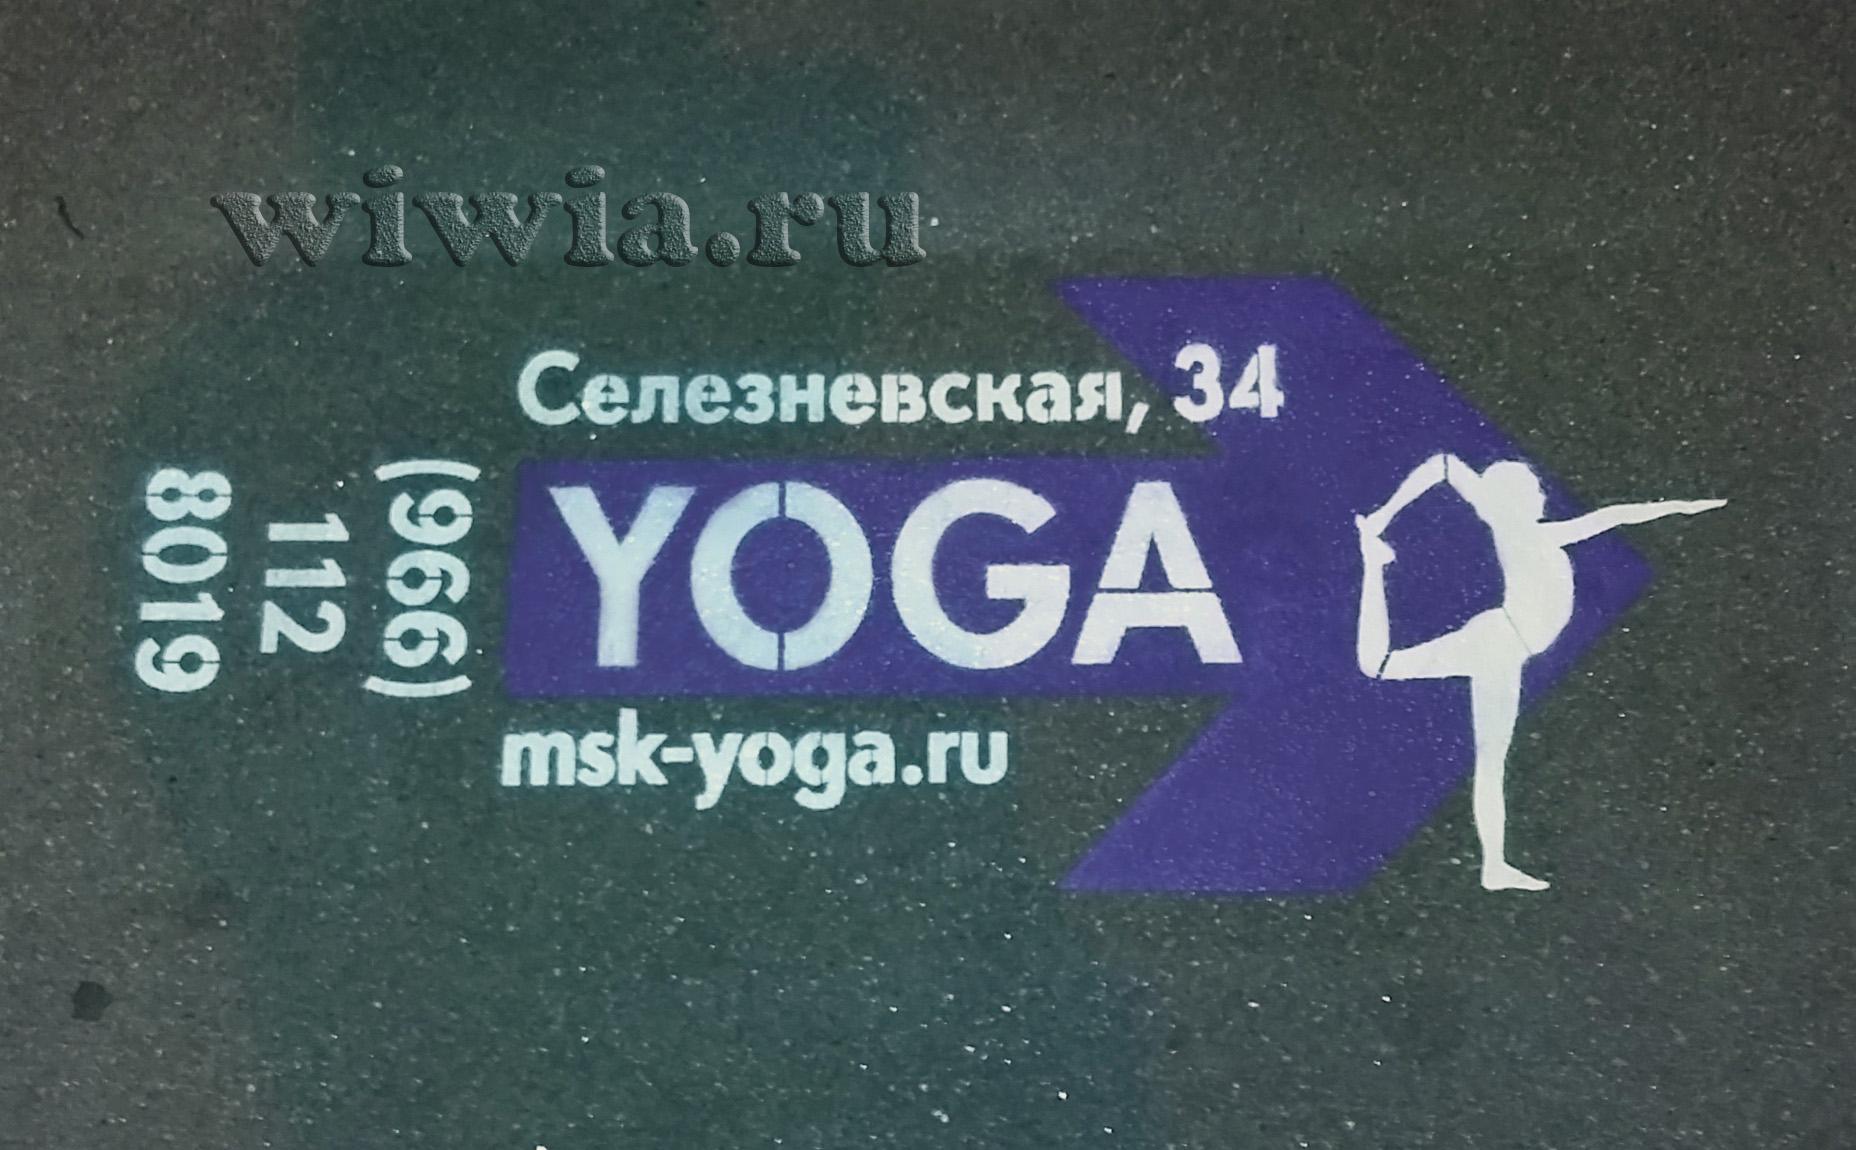 Реклама на асфальте. Yoga.